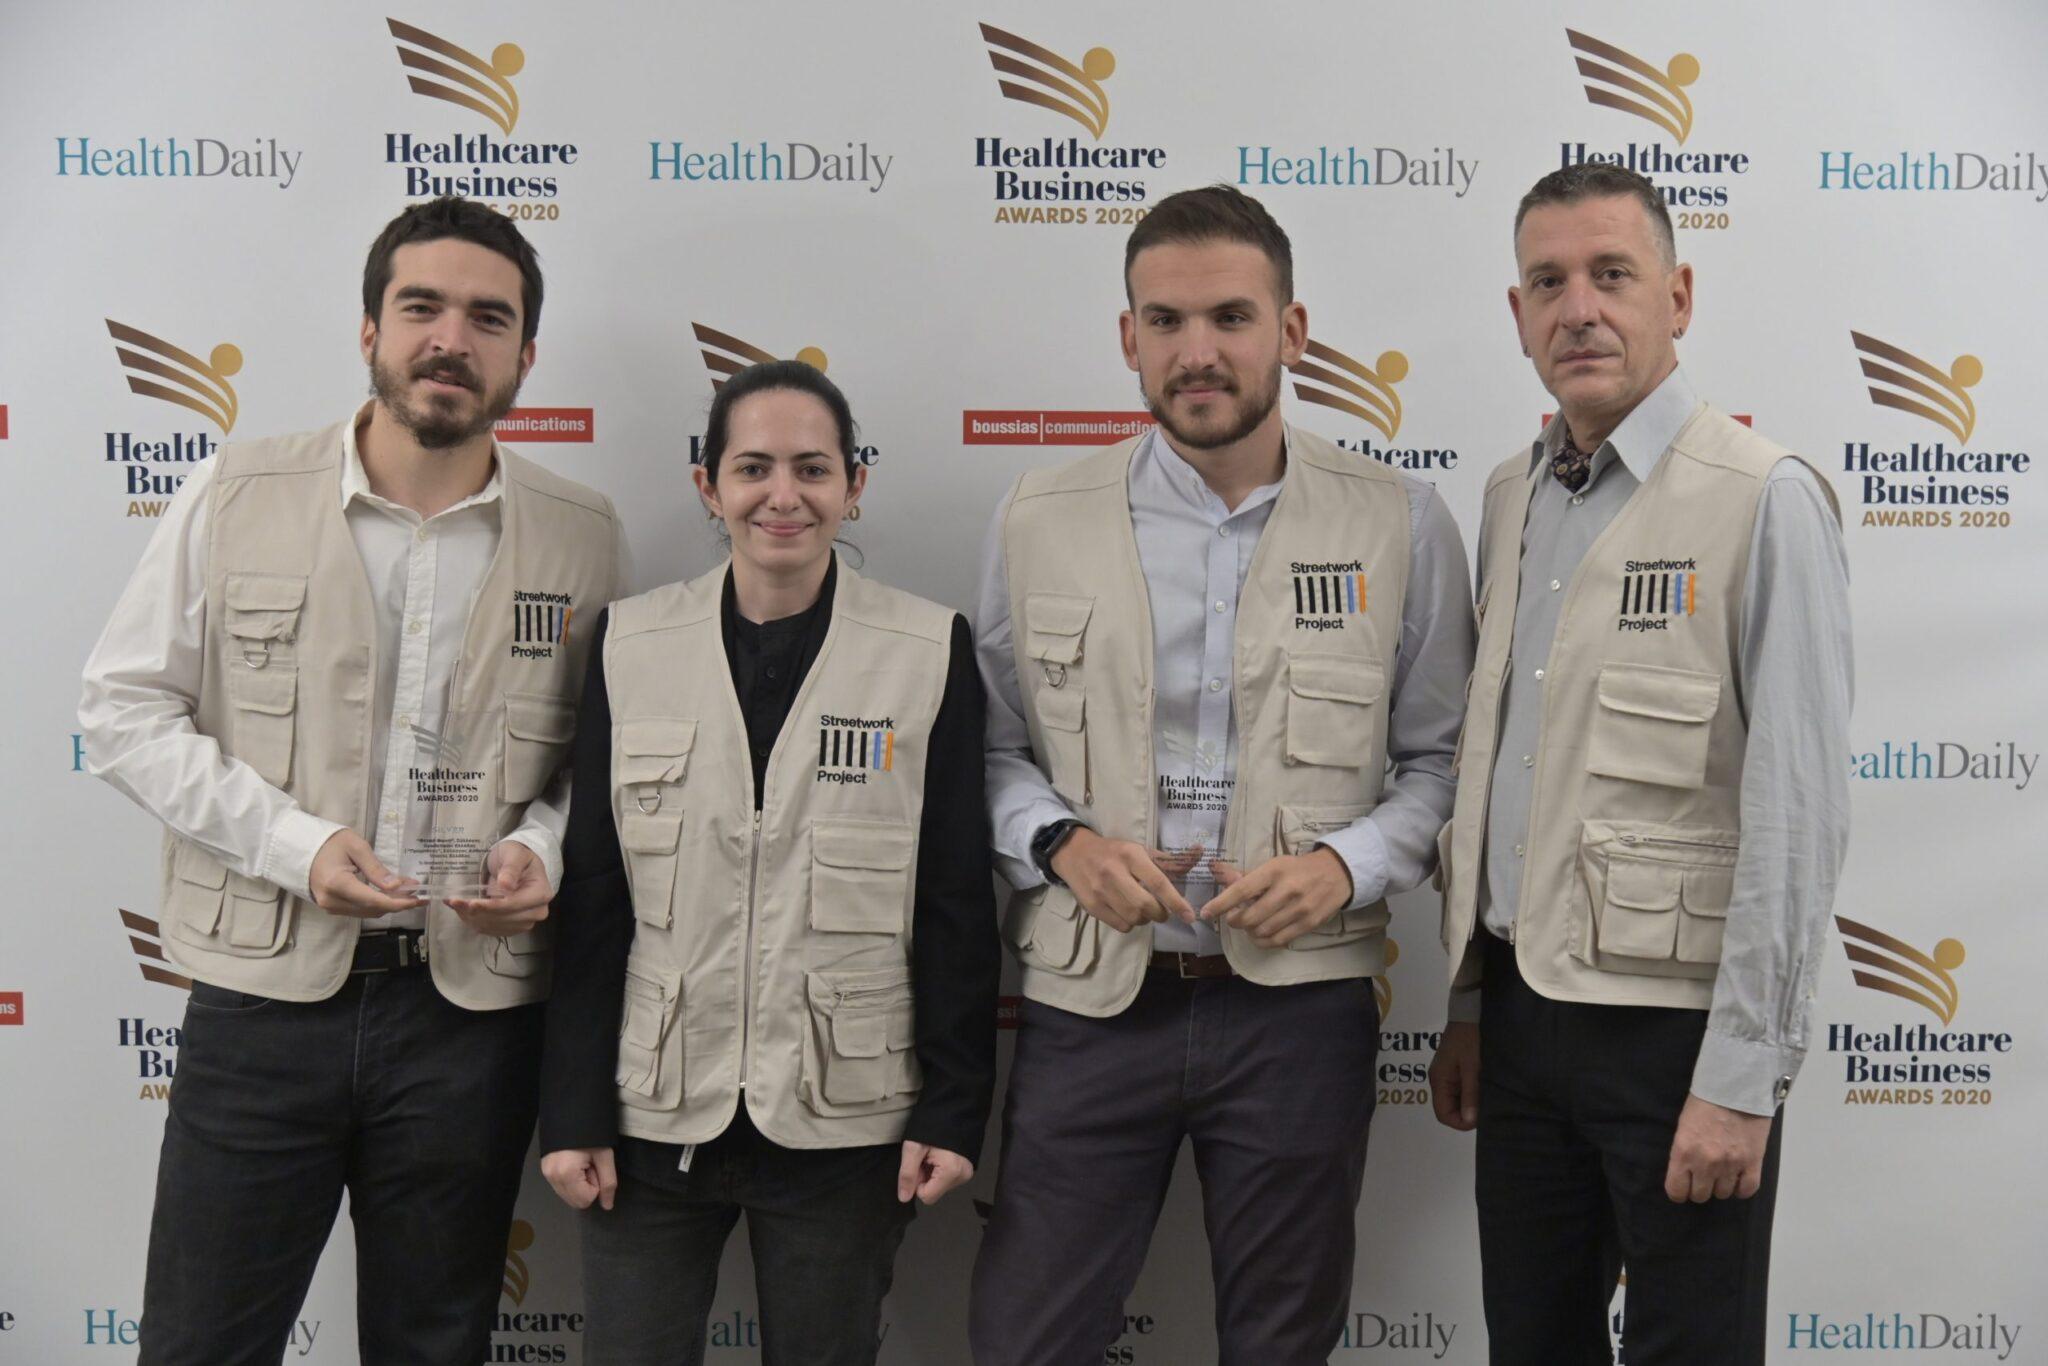 Silver Award για το Streetwork Project της Θετικής Φωνής και του Προμηθέα στα Healthcare Business Awards 2020